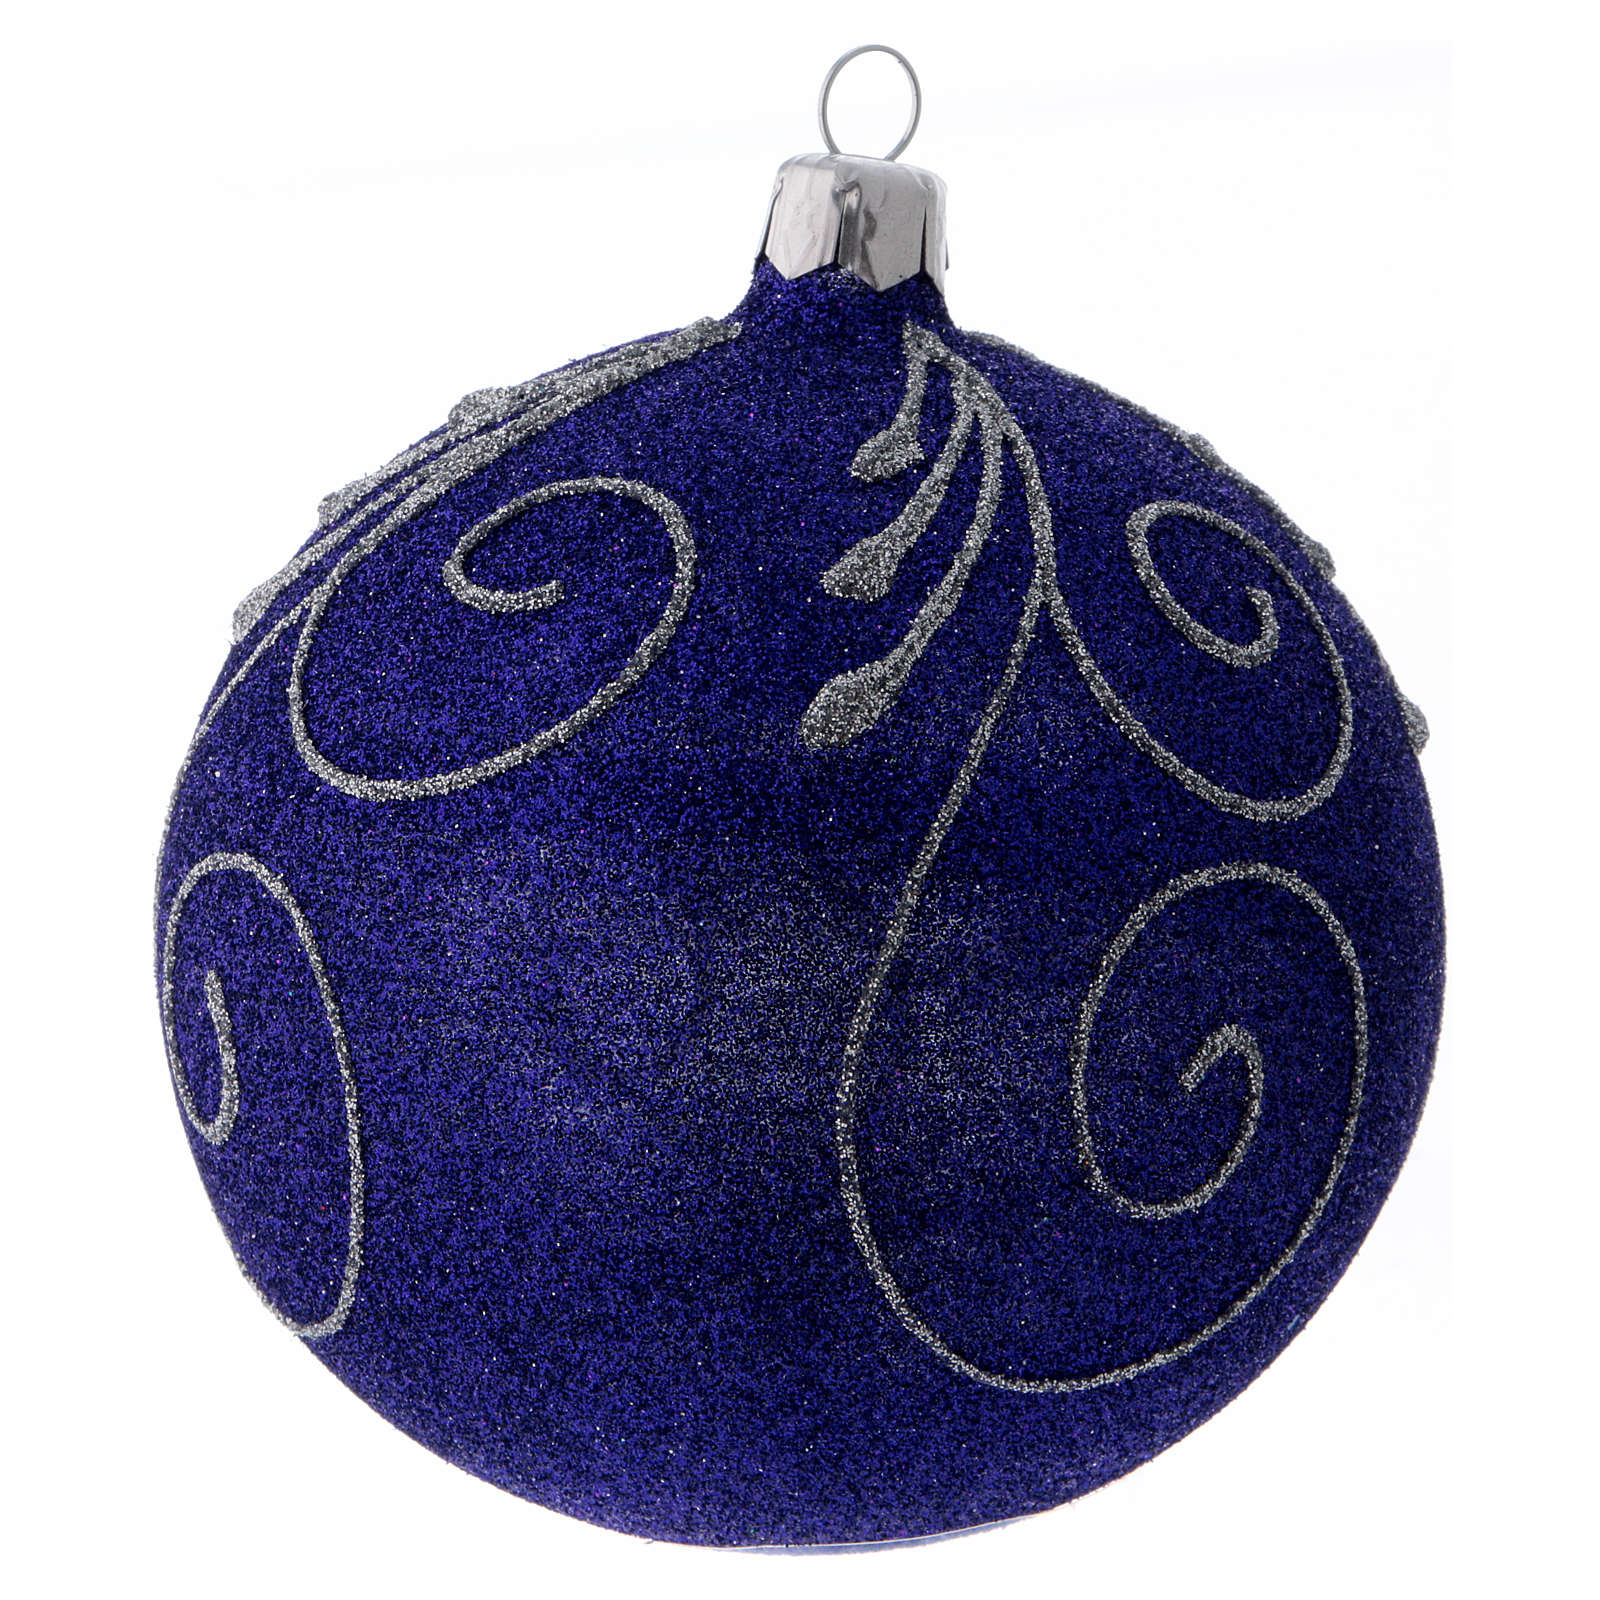 Bolita Navidad vidrio violeta con purpurina y plata 100 mm 4